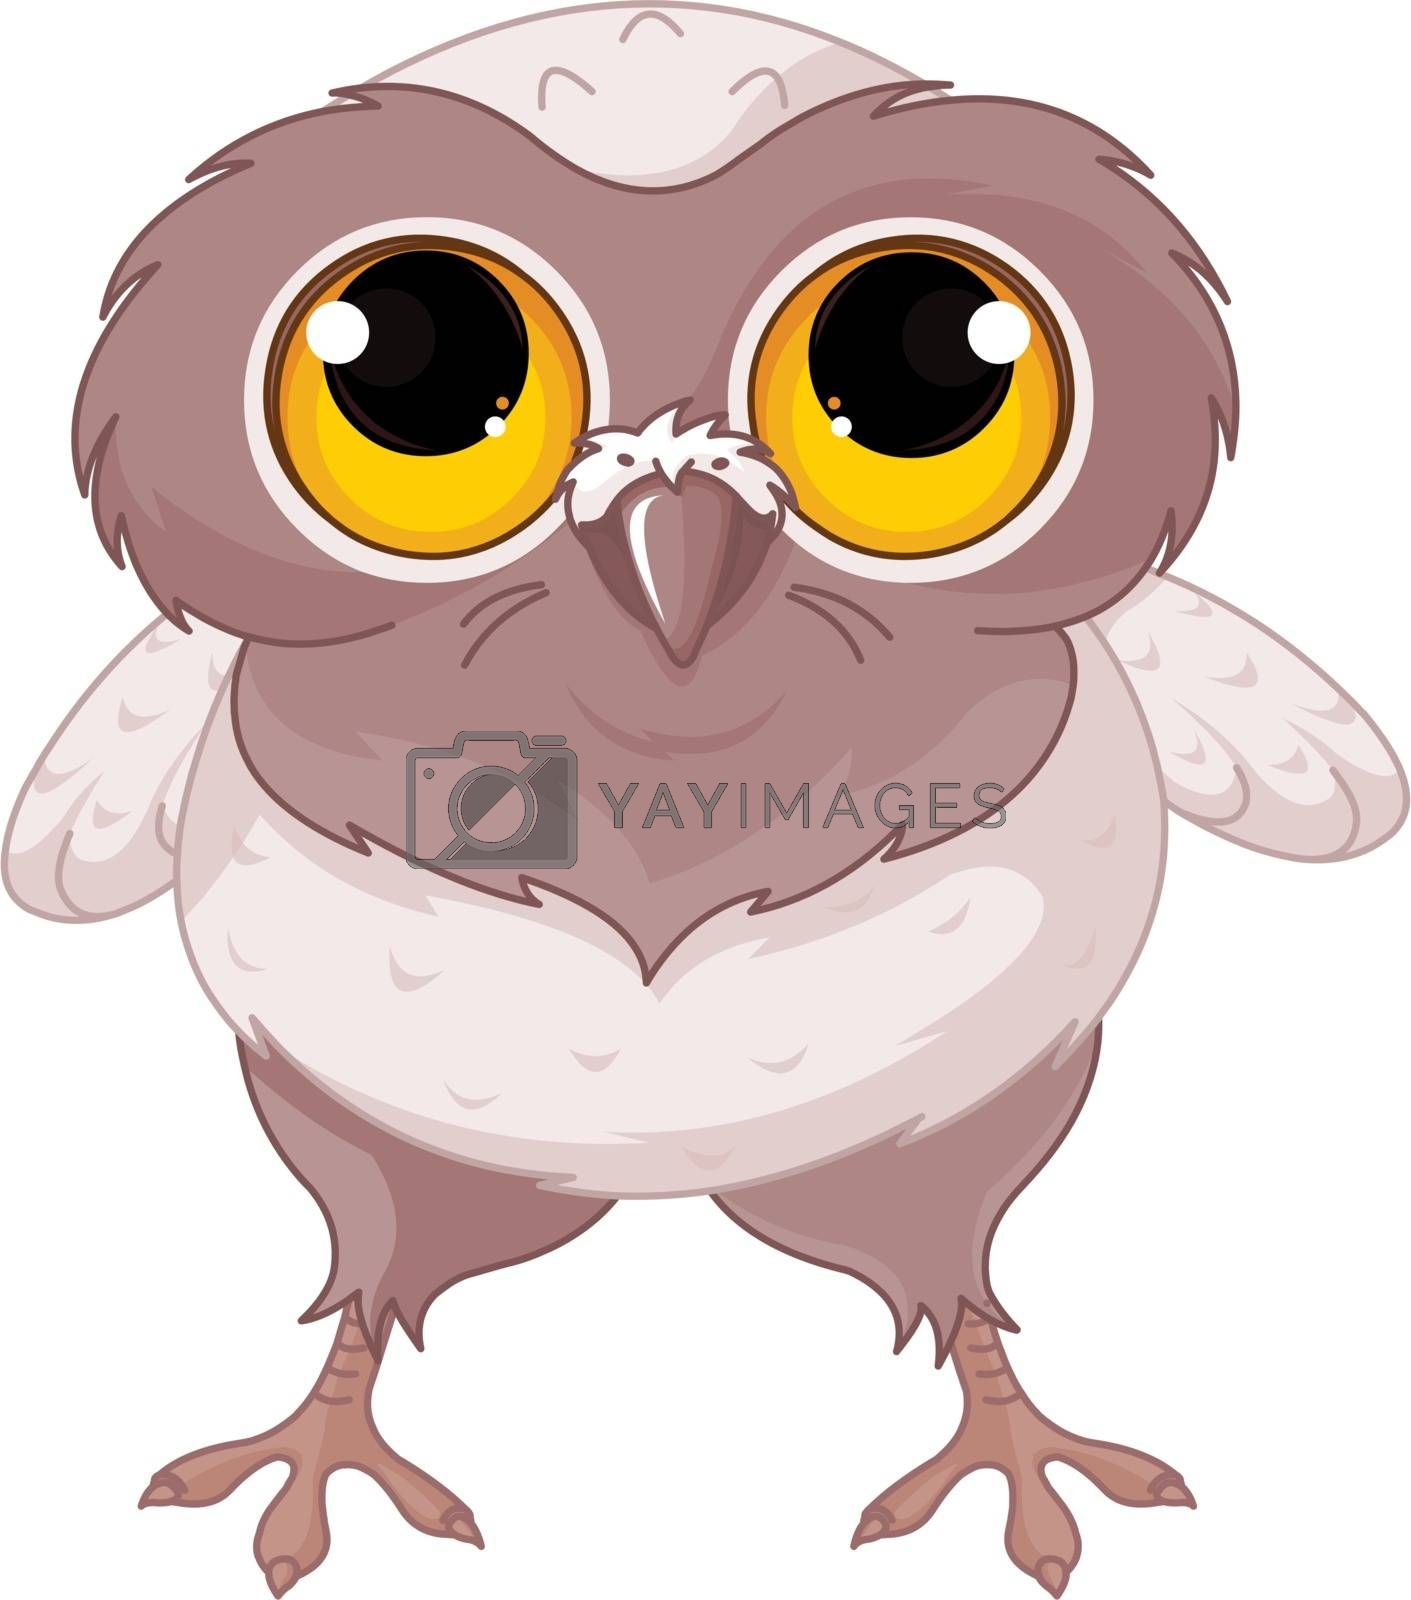 Illustration of a cartoon baby owl.